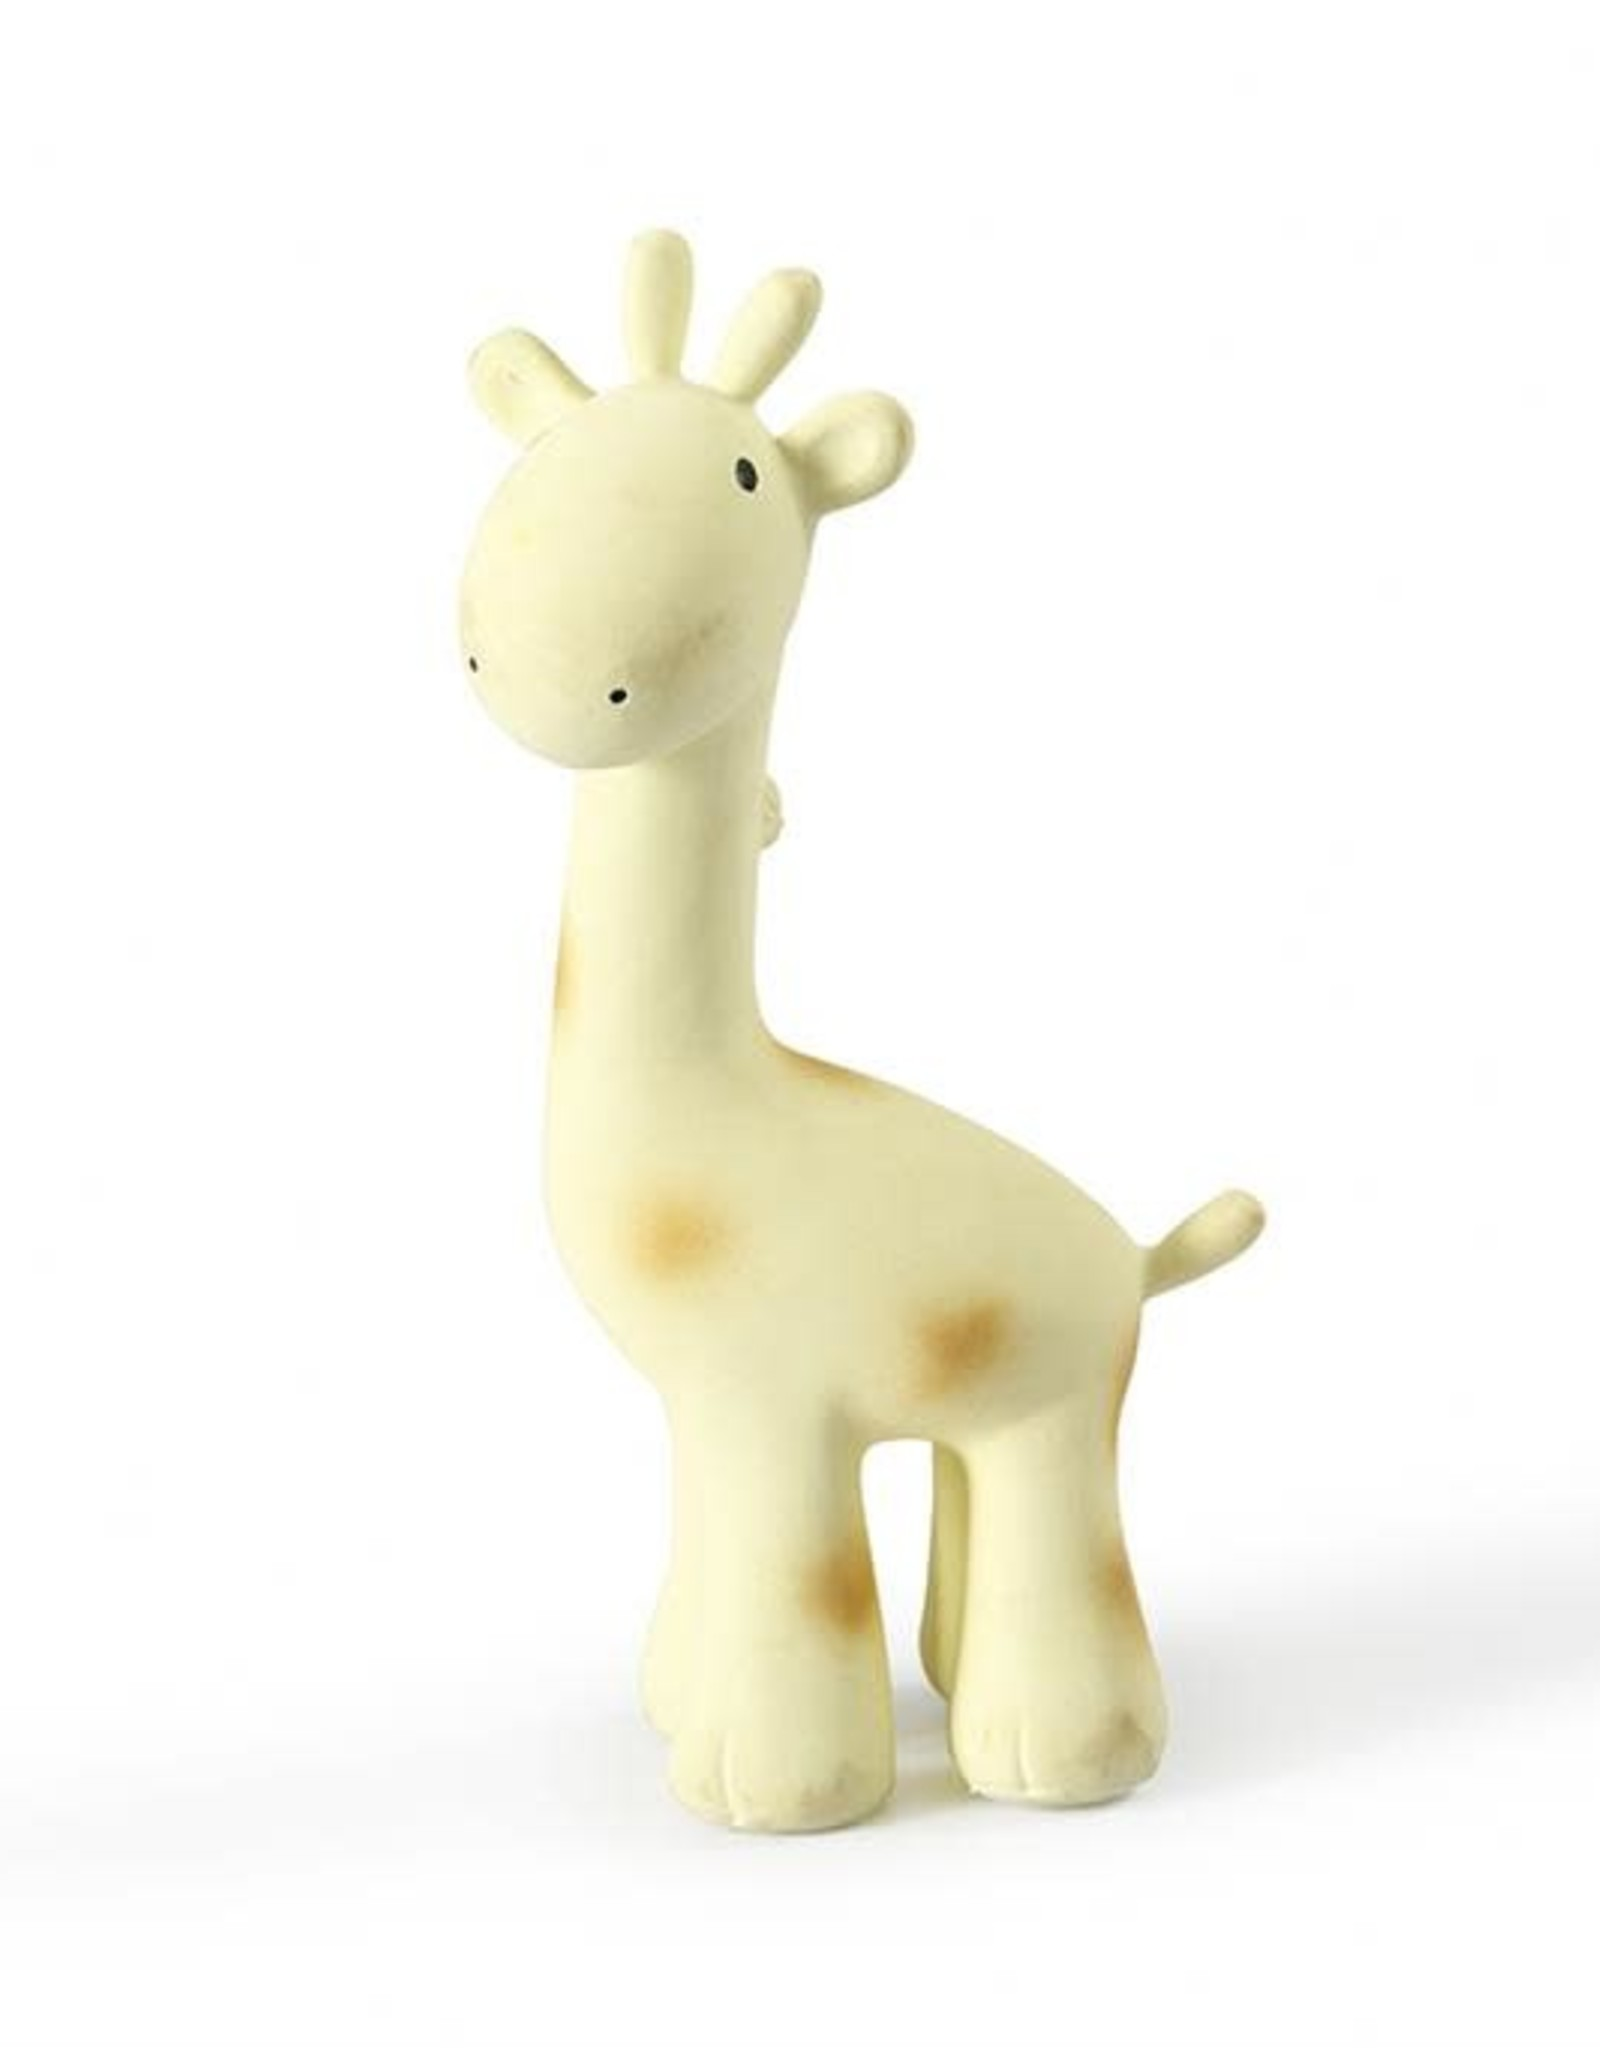 Tikiri Bijtspeeltje Giraf